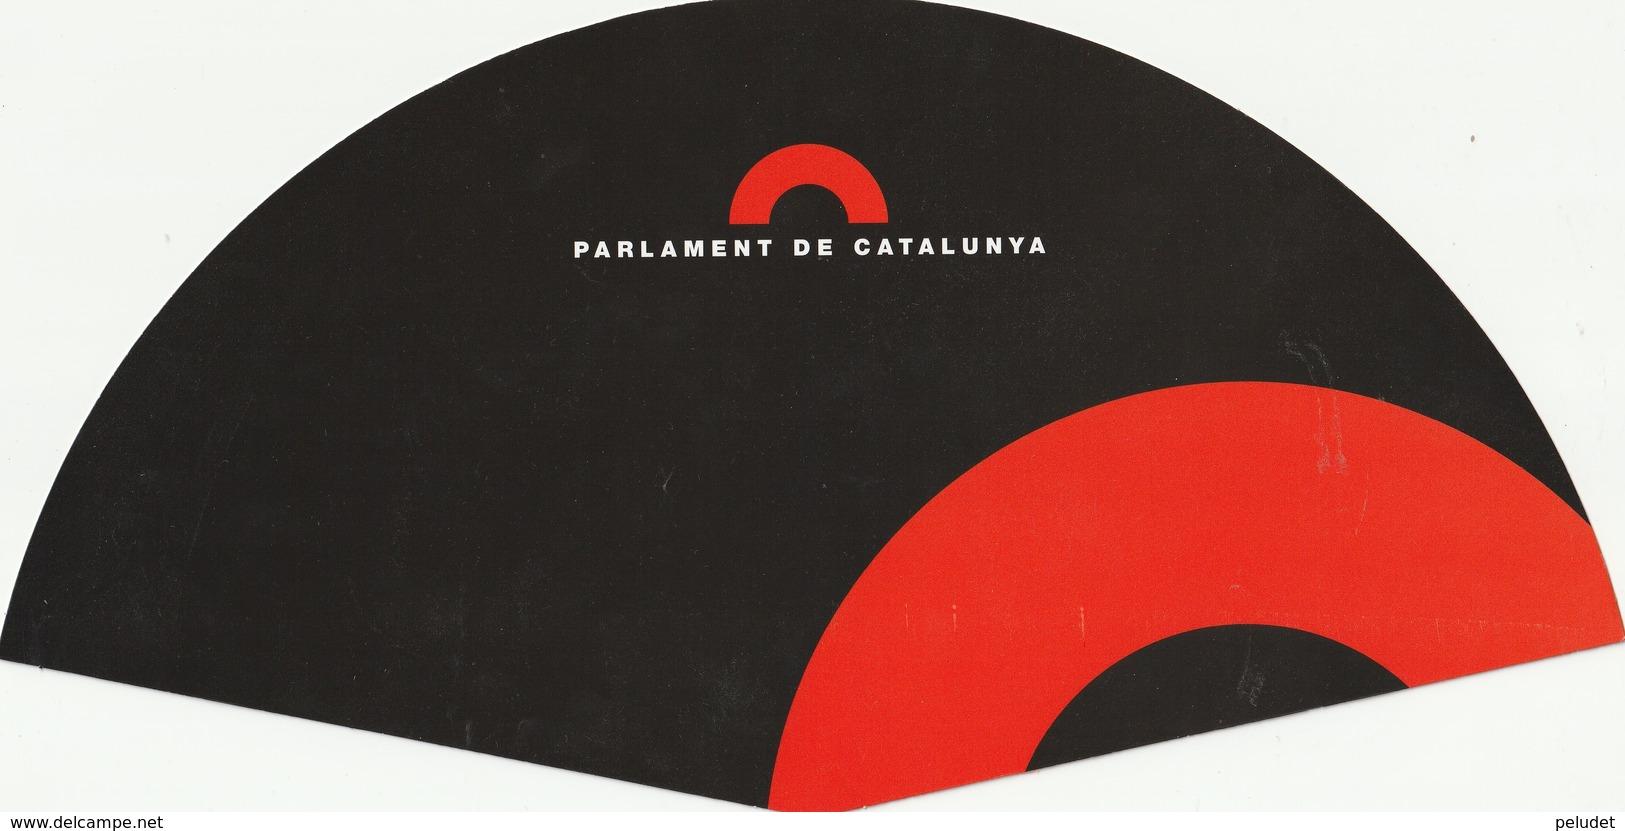 Abanico - Pay Pay - éventail - PARLAMENT DE CATALUNYA - Material Y Accesorios